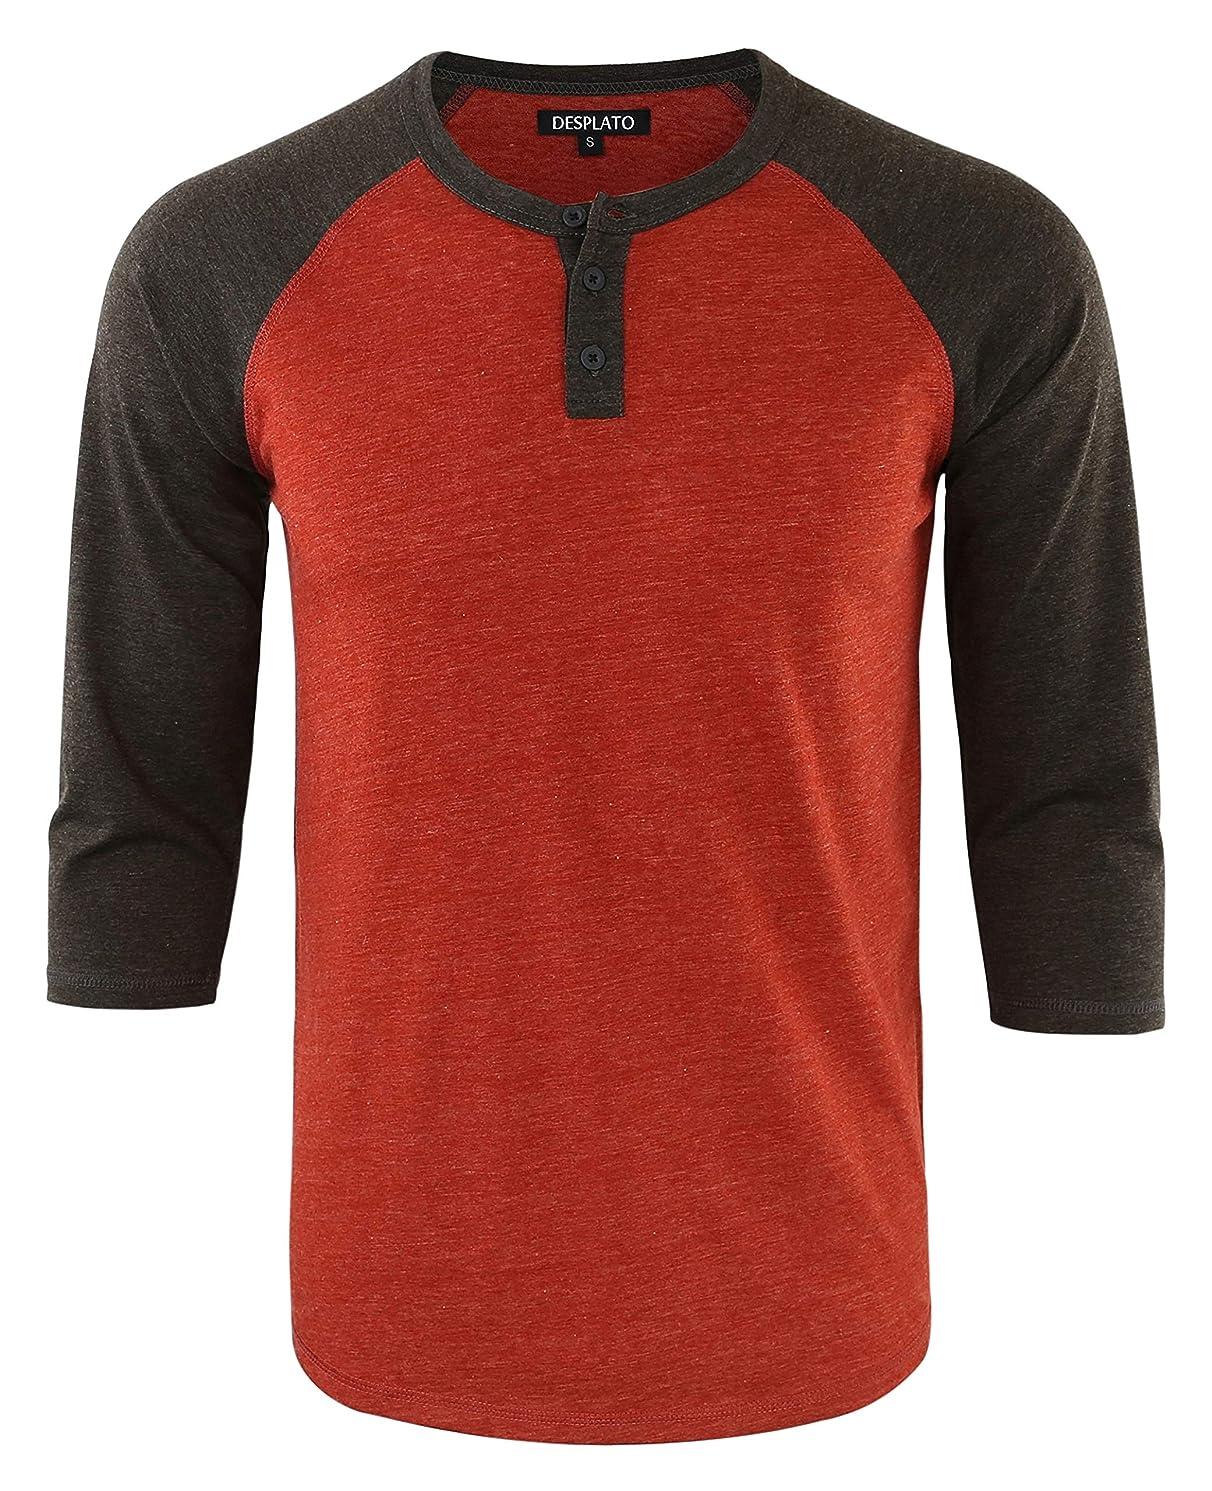 DESPLATO Men's Casual Vintage 3/4 Sleeve Henley Baseball Jersey Knit T Shirts